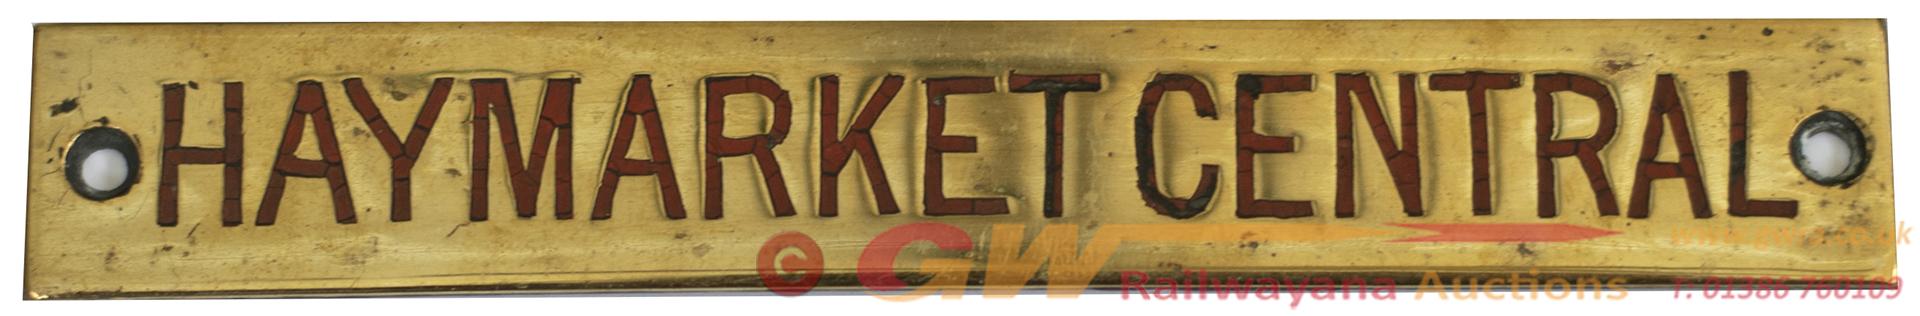 North British Railway Brass Signal Box Shelfplate